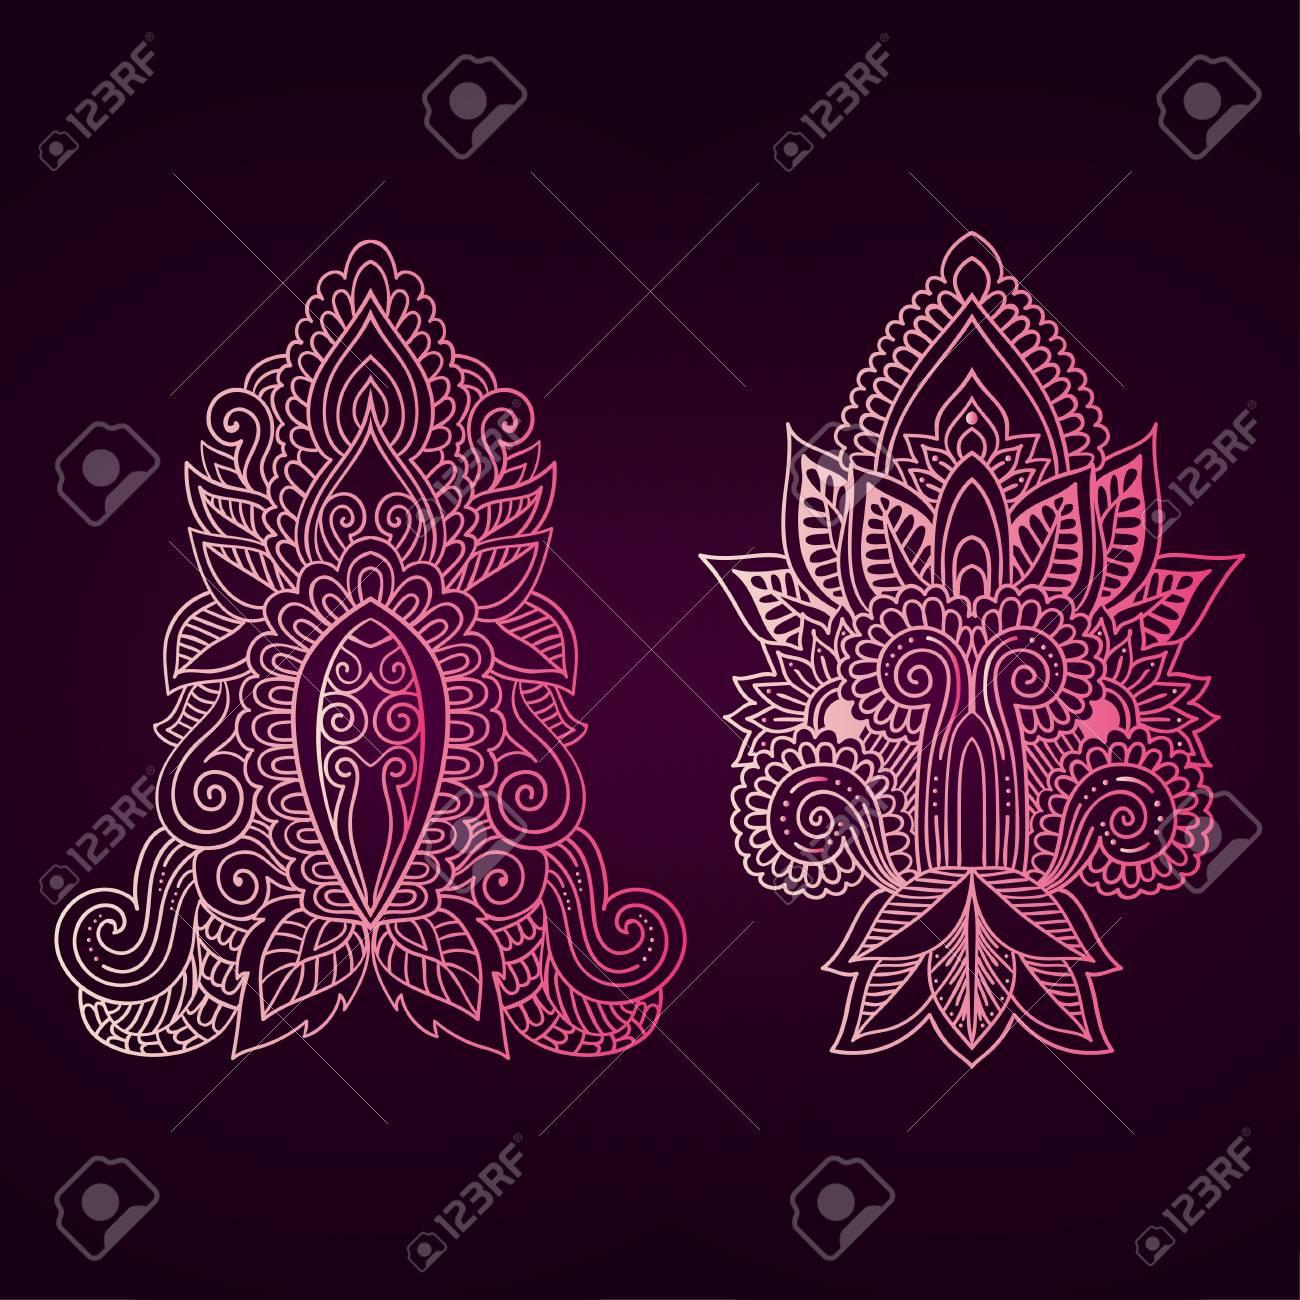 Vector ornamental lotus flower ethnic art patterned indian vector ornamental lotus flower ethnic art patterned indian paisley hand drawn illustration izmirmasajfo